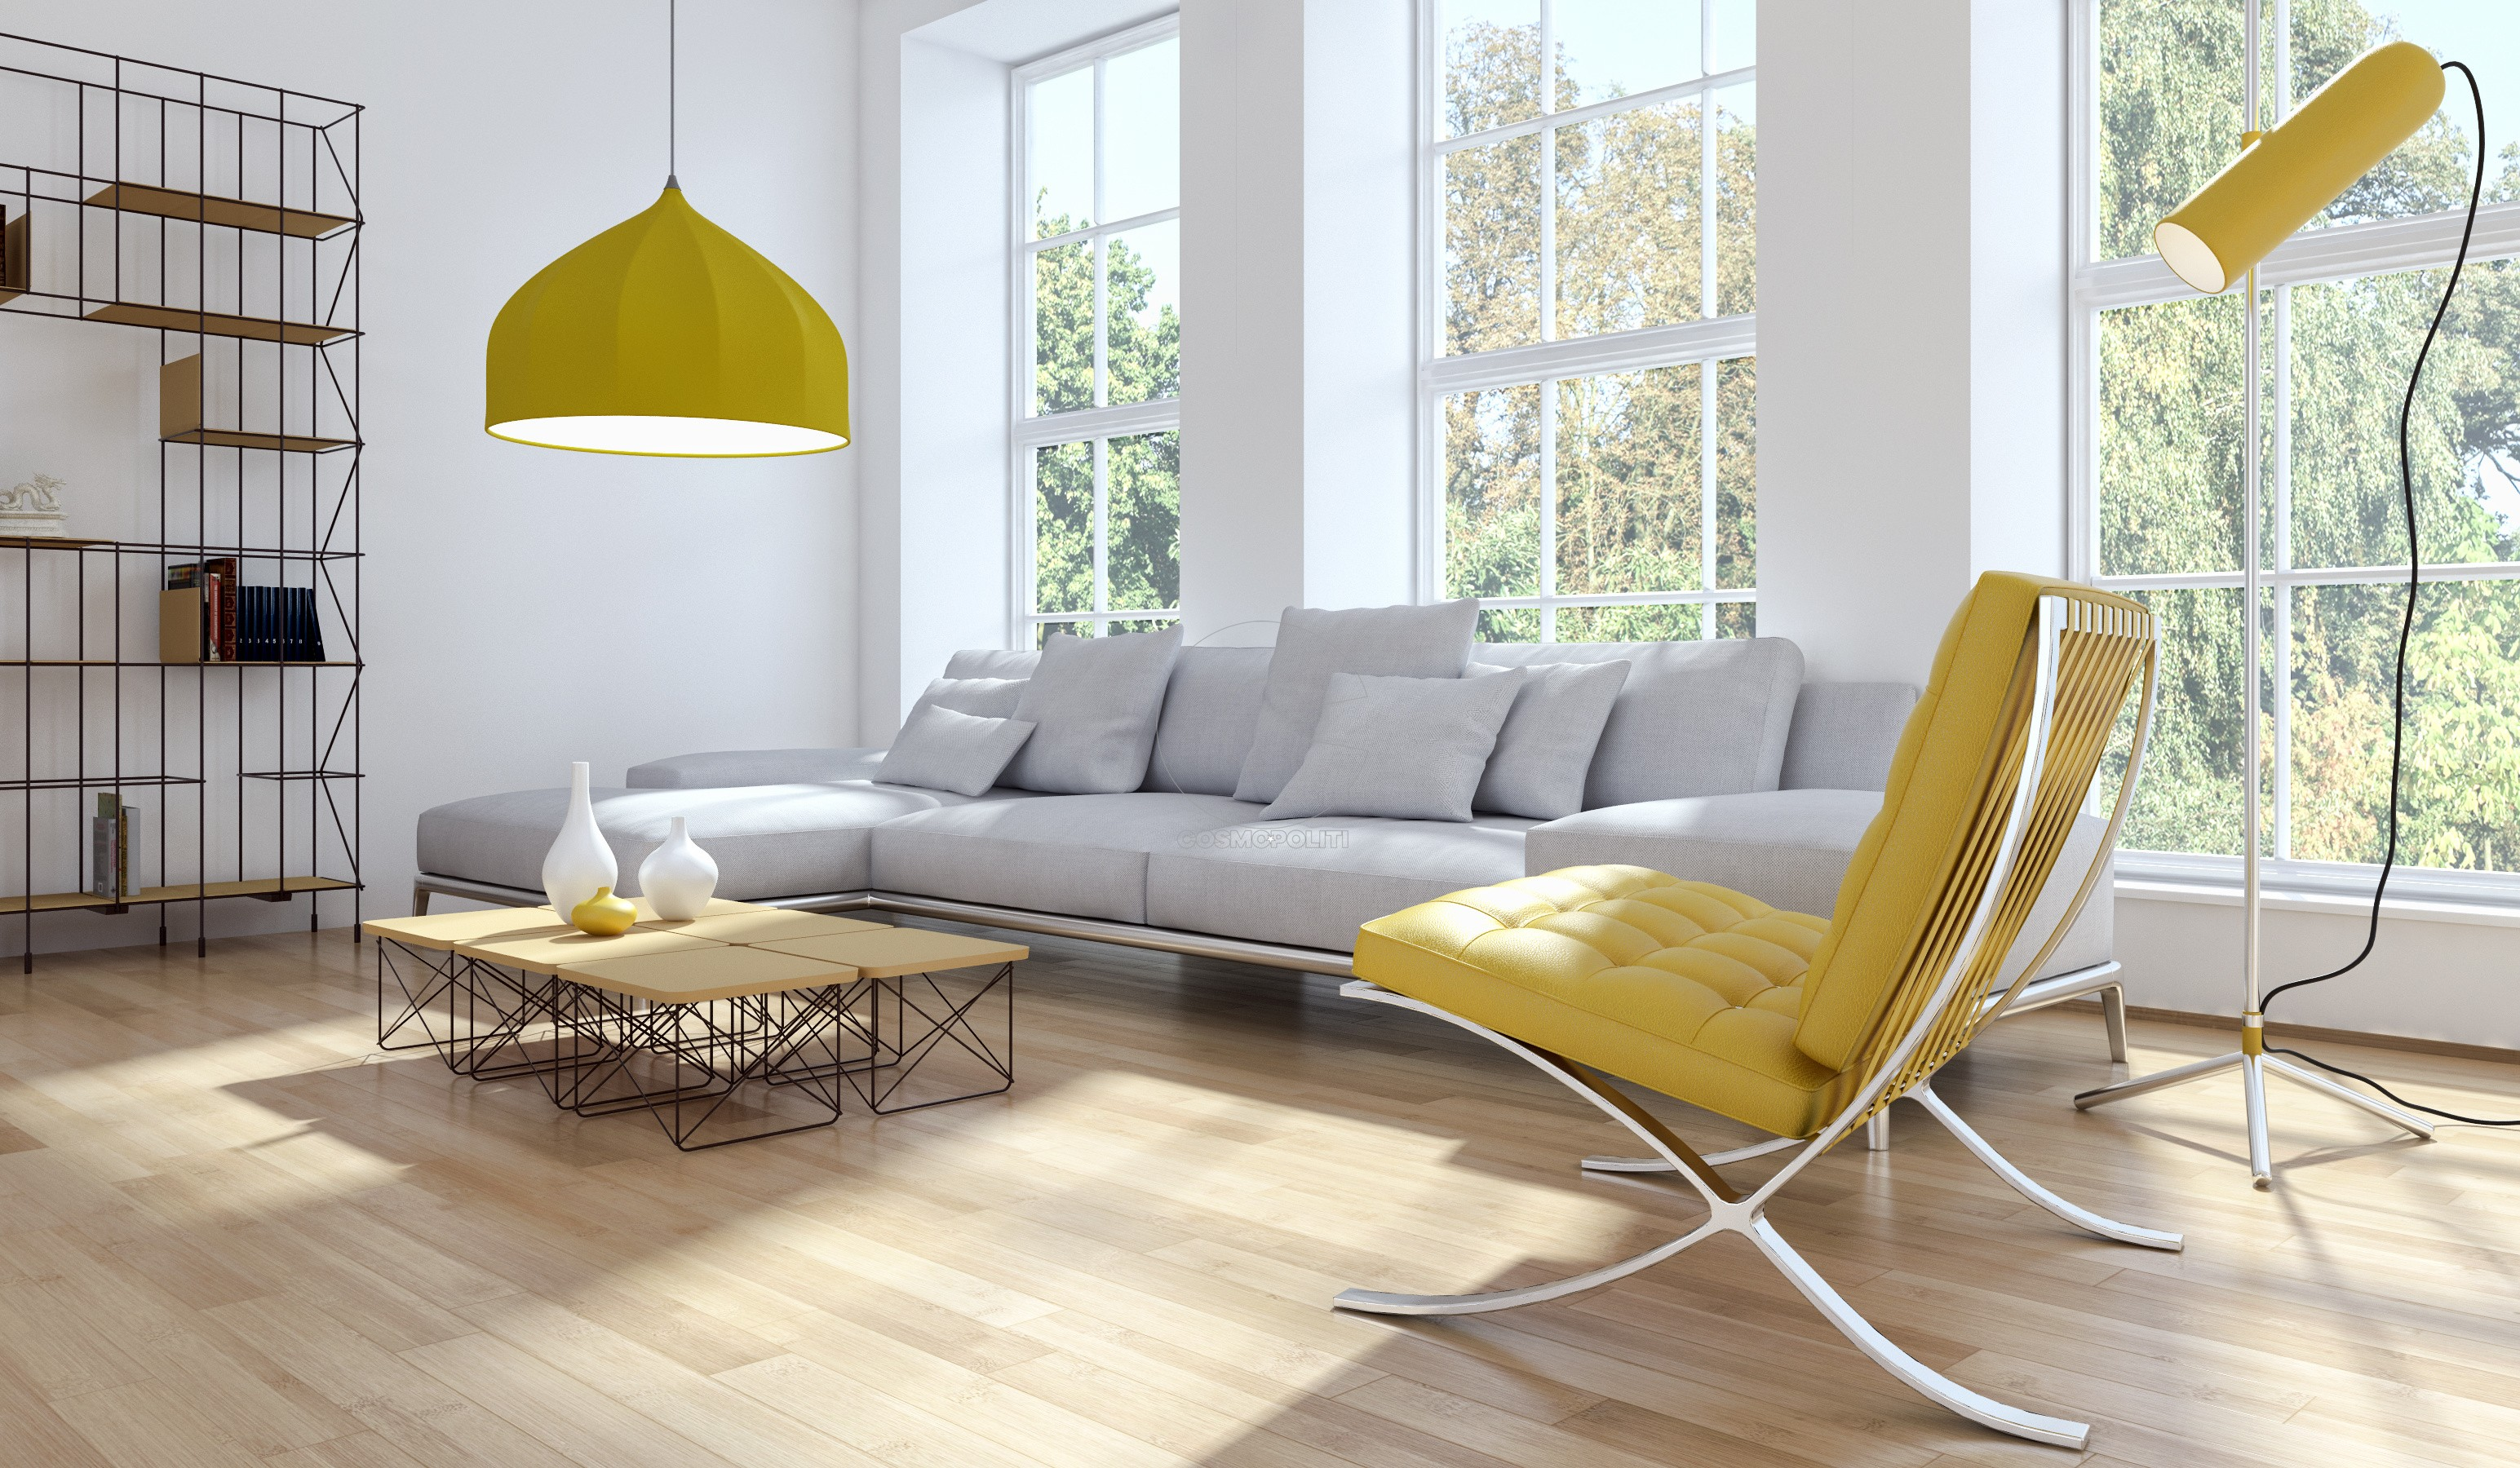 hot-interior-design-trends-for-summer-blog_elements-of-interior-design_craftsman-home-plans-build-a-house-plan-inside-decor-ideas-intereior-design-new-interior-designs-inter